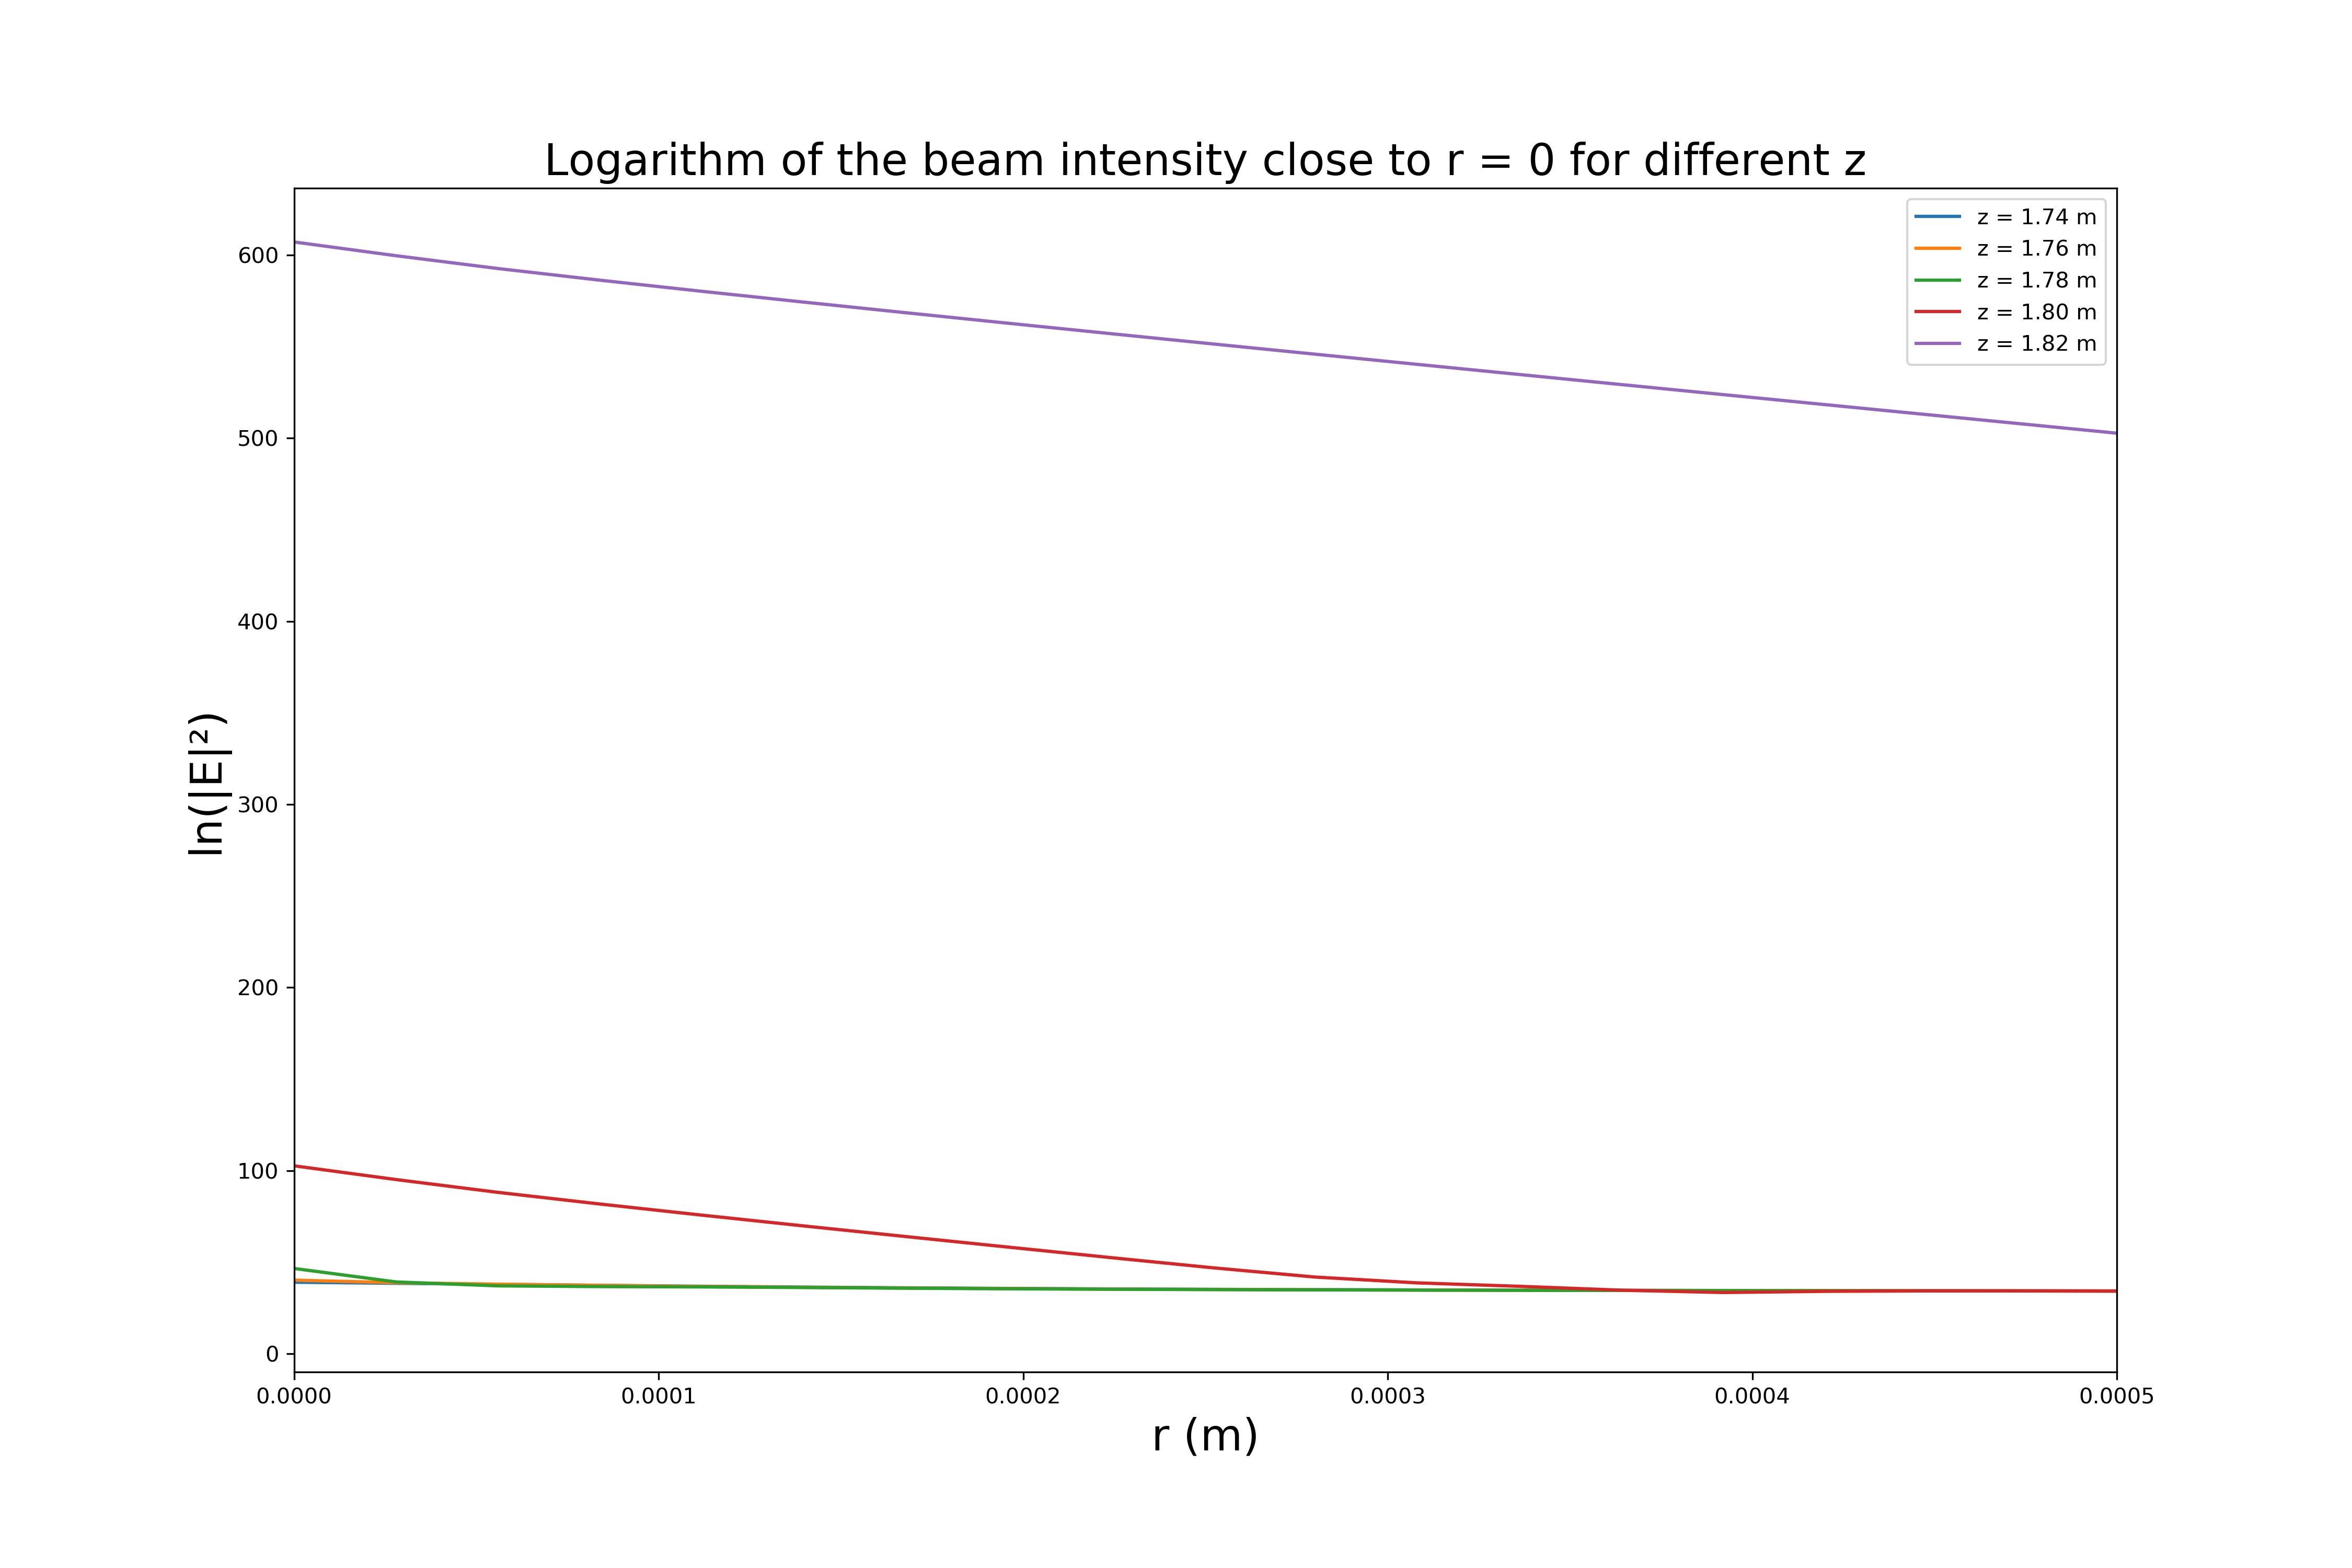 figures/KCN/energy_divergence.png